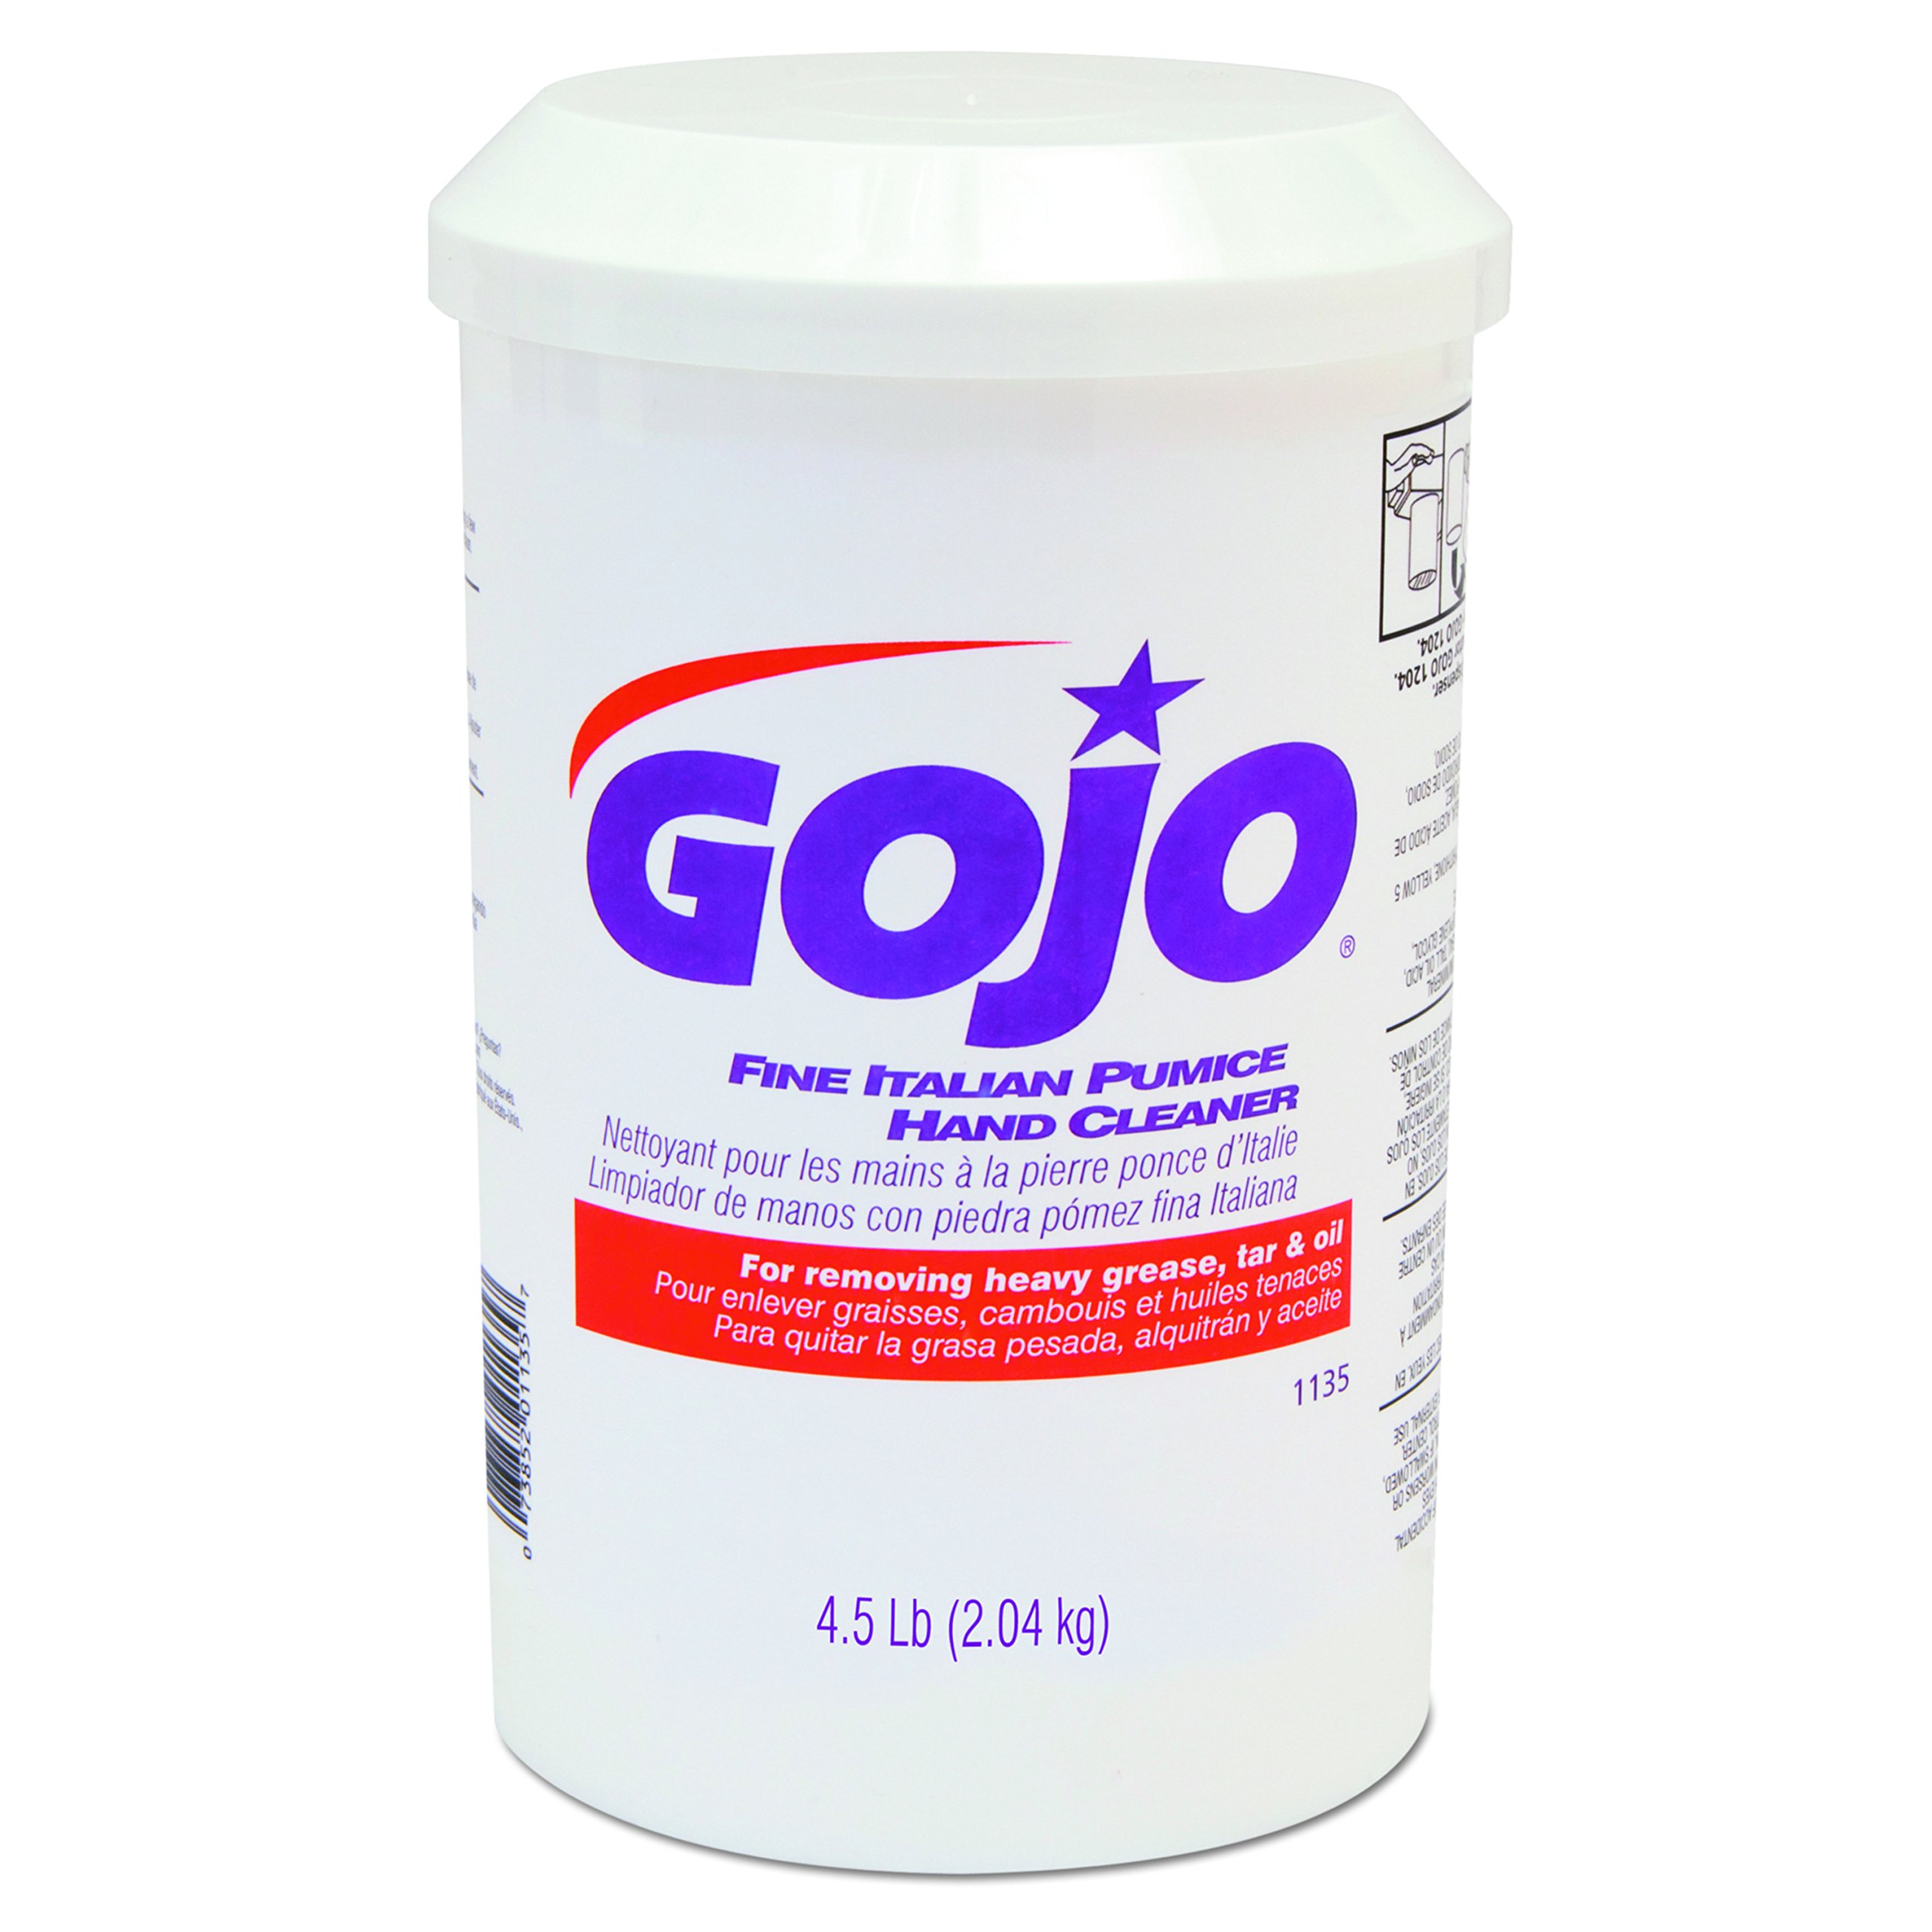 GOJO 113506 Fine Italian Pumice Hand Cleaner, Lemon, 4 1/2 lb Cartridge (Case of 6)